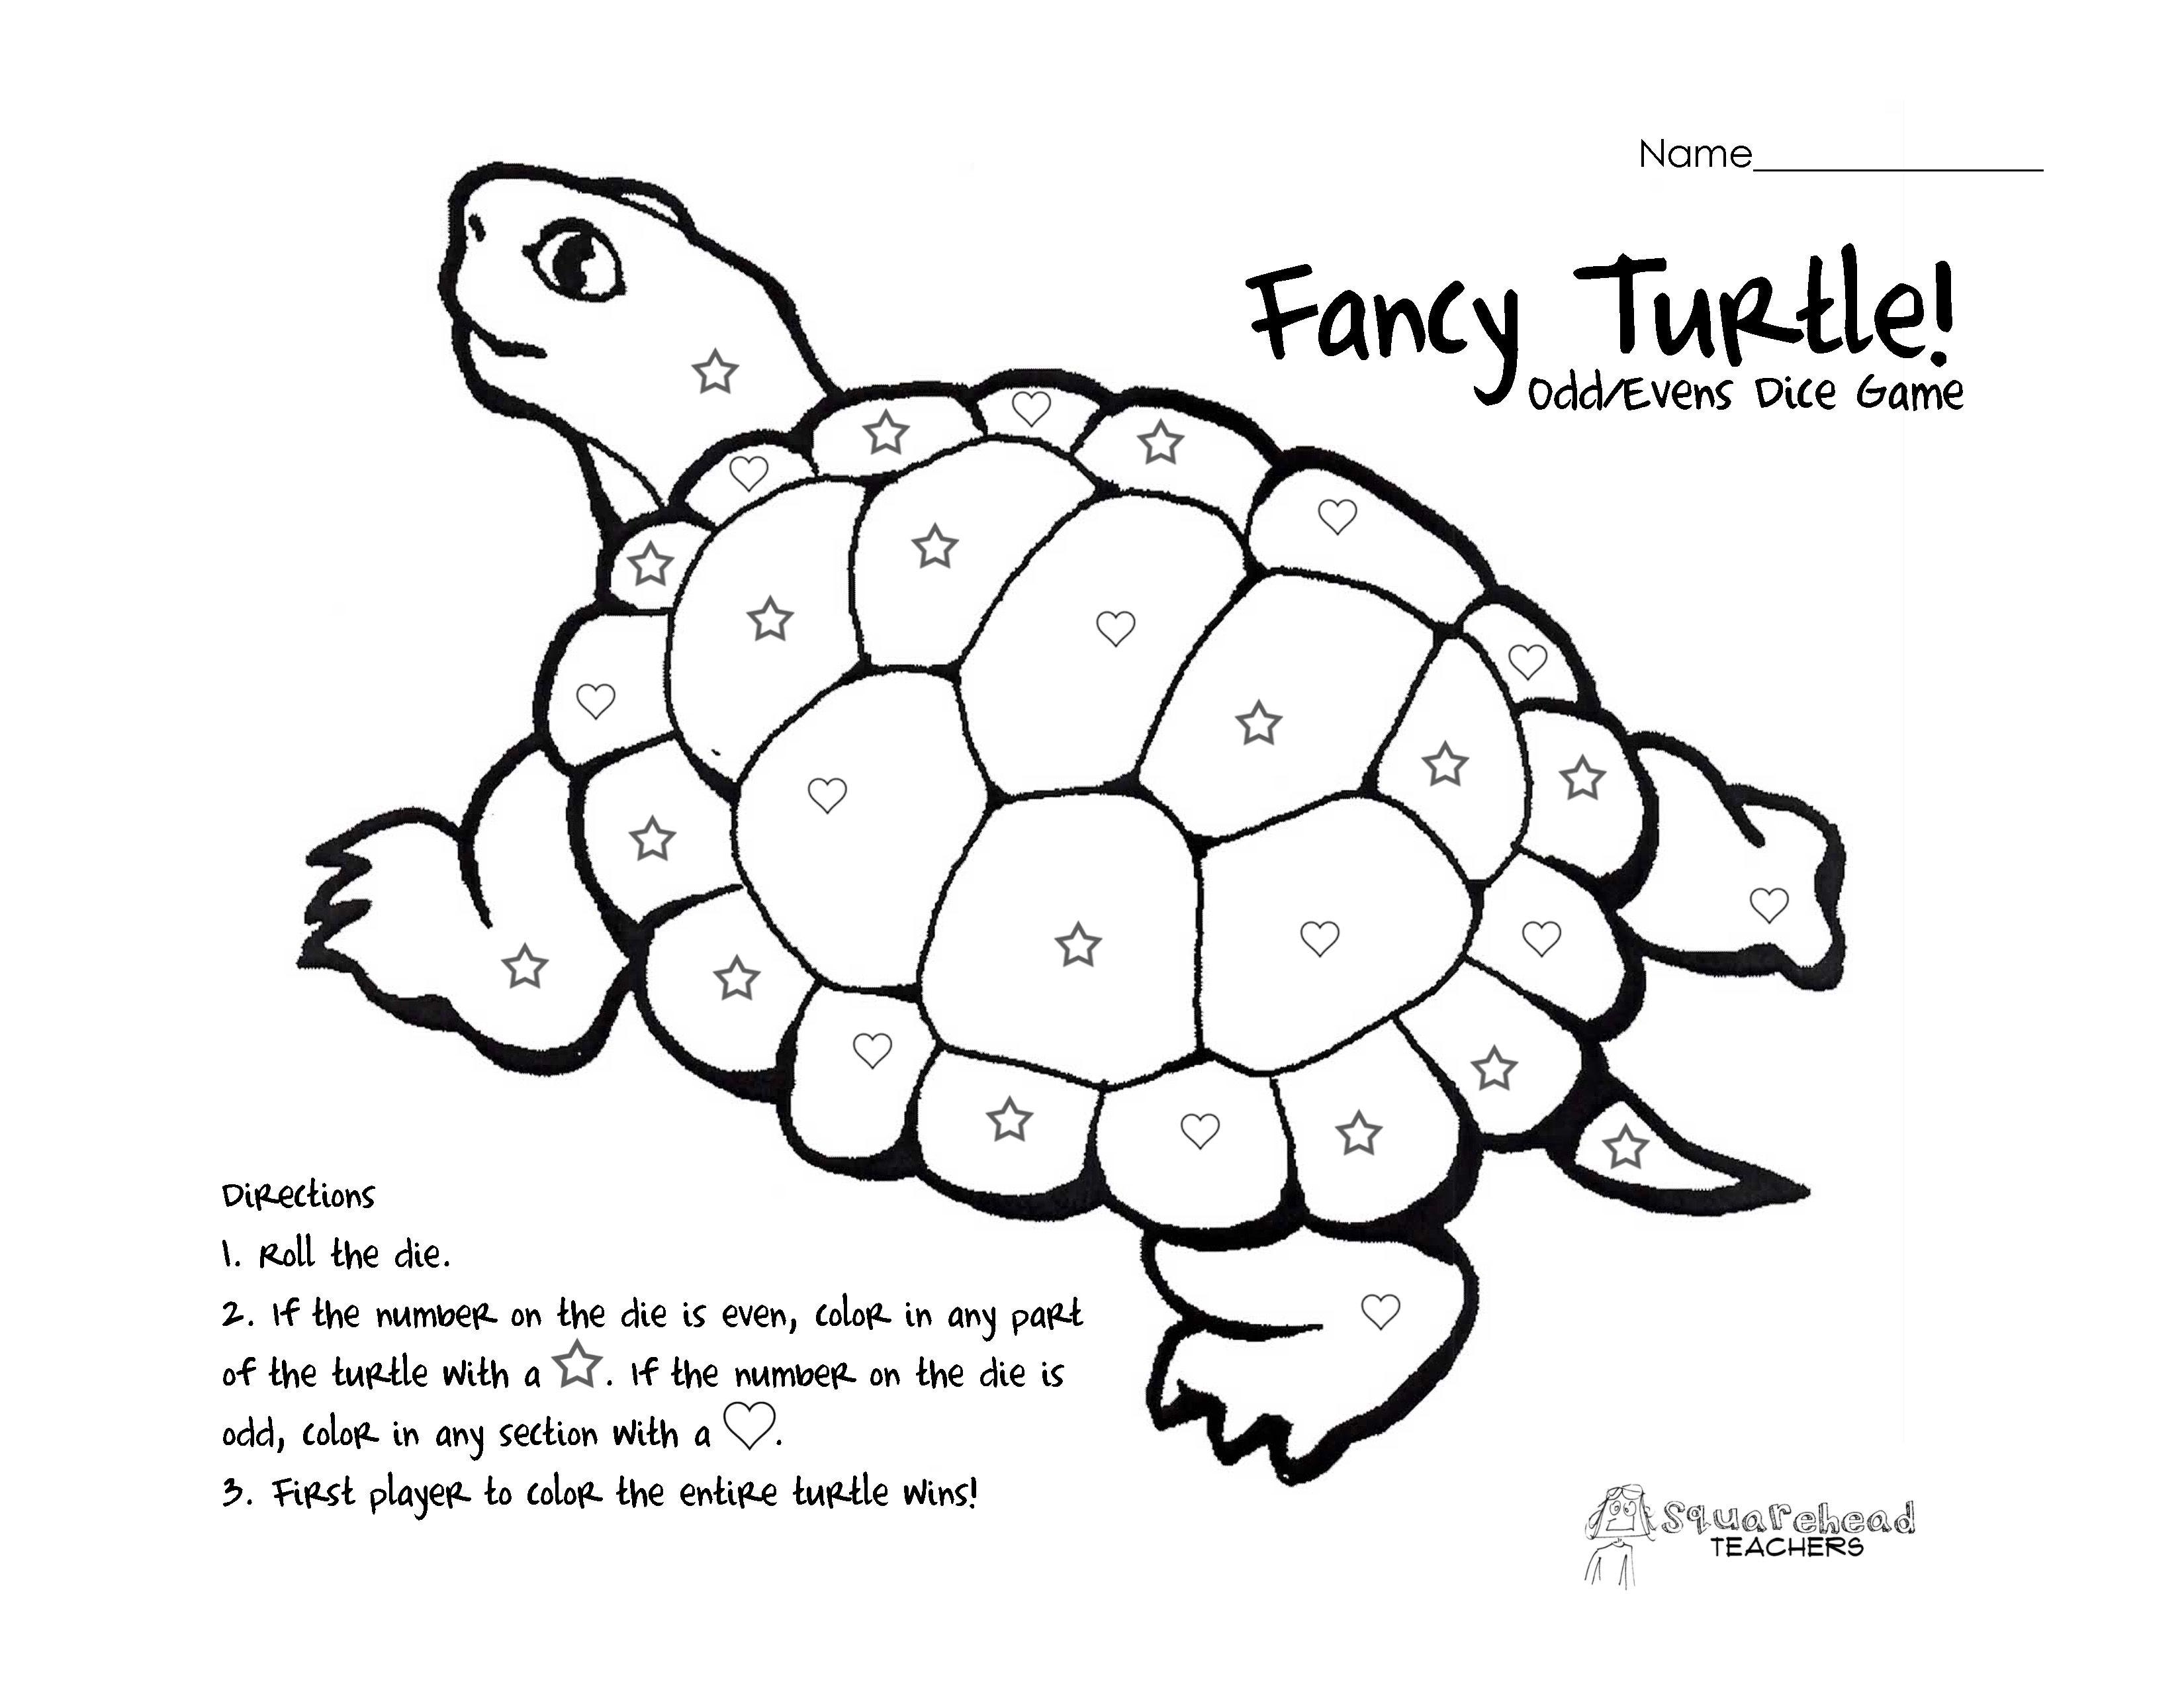 Fancy Turtle Odd Evens Dice Game Turtle Pattern Cartoon